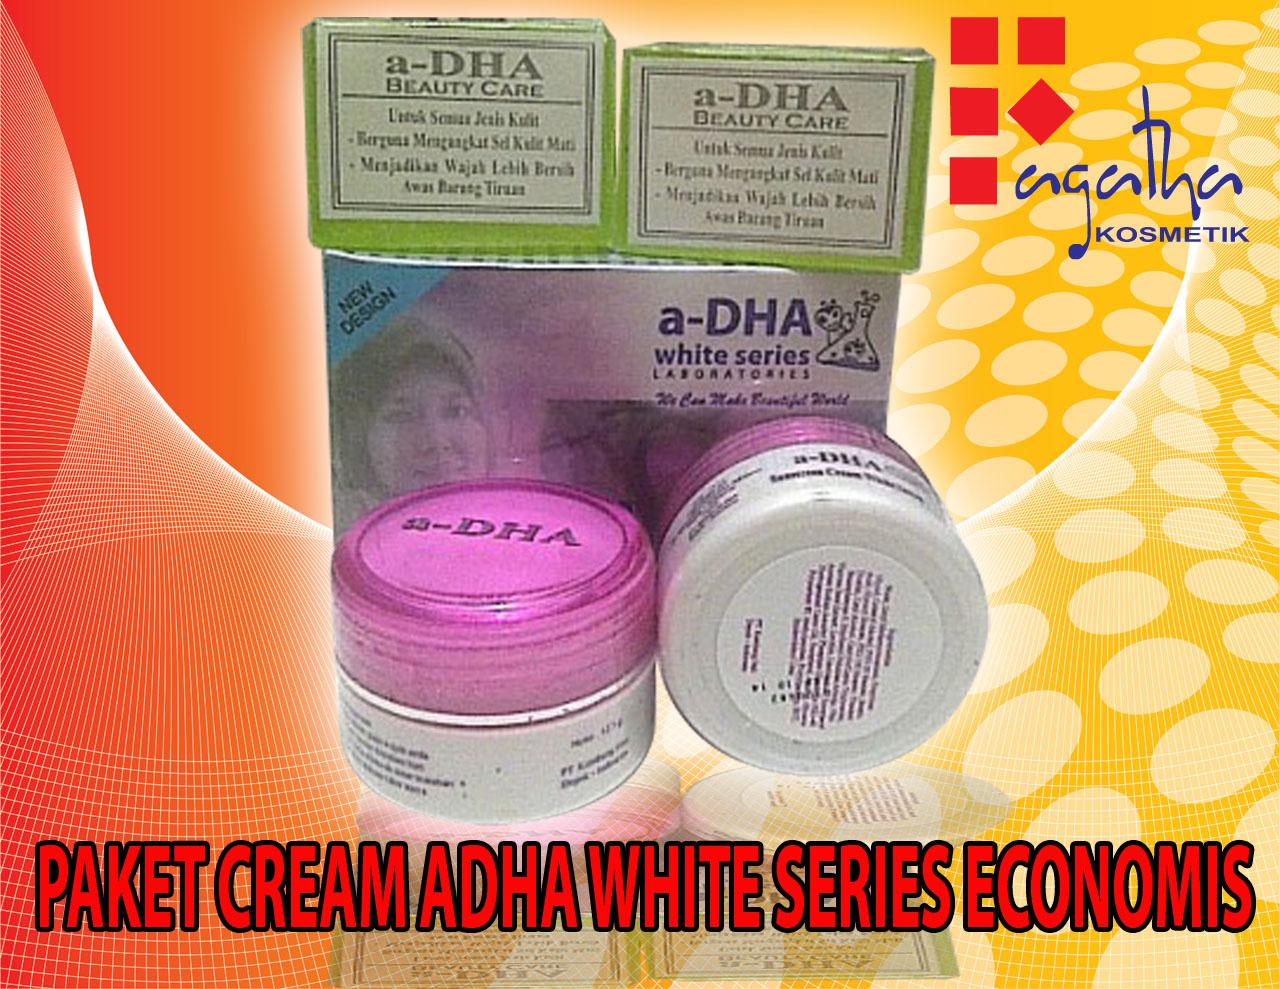 Fagatha Kosmetik Grosir Termurah Dan Terpercaya A Dha Cream Hologram Isi Paket White Series Ekonomis